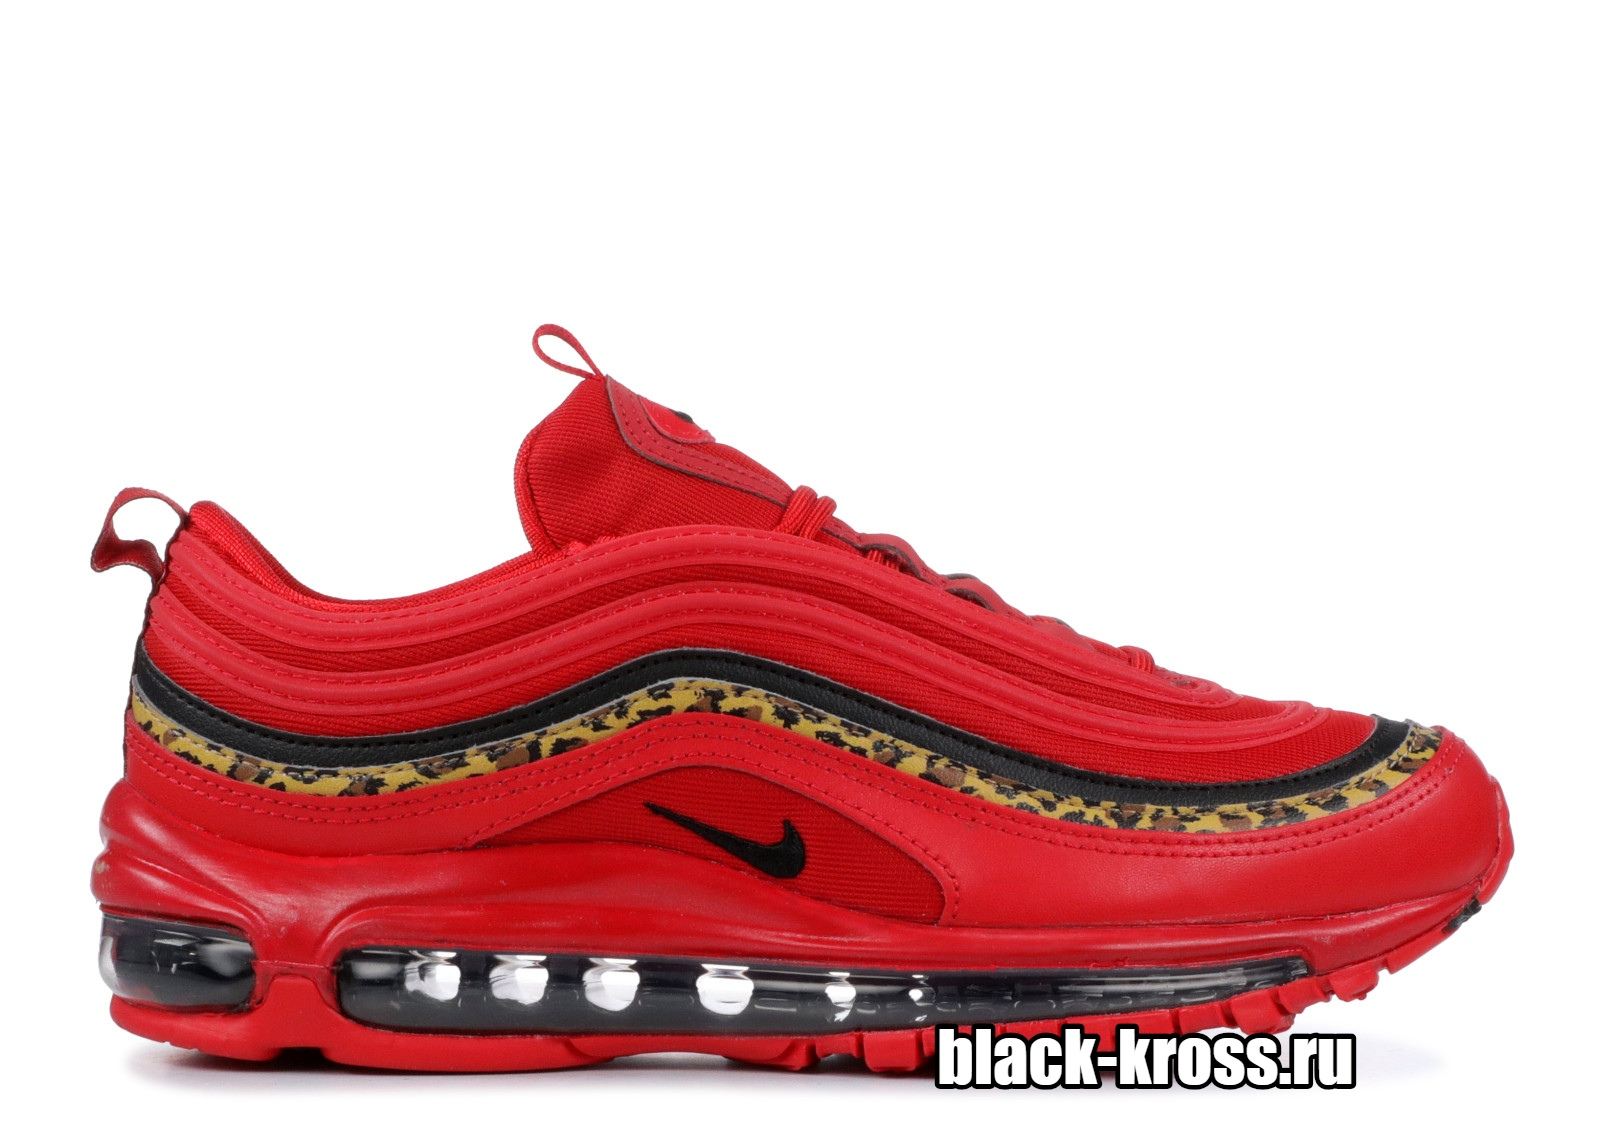 d5ffbccf Nike Air Max 97 Premium Red (41-45). Quick View. КУПИТЬ В 1 КЛИК